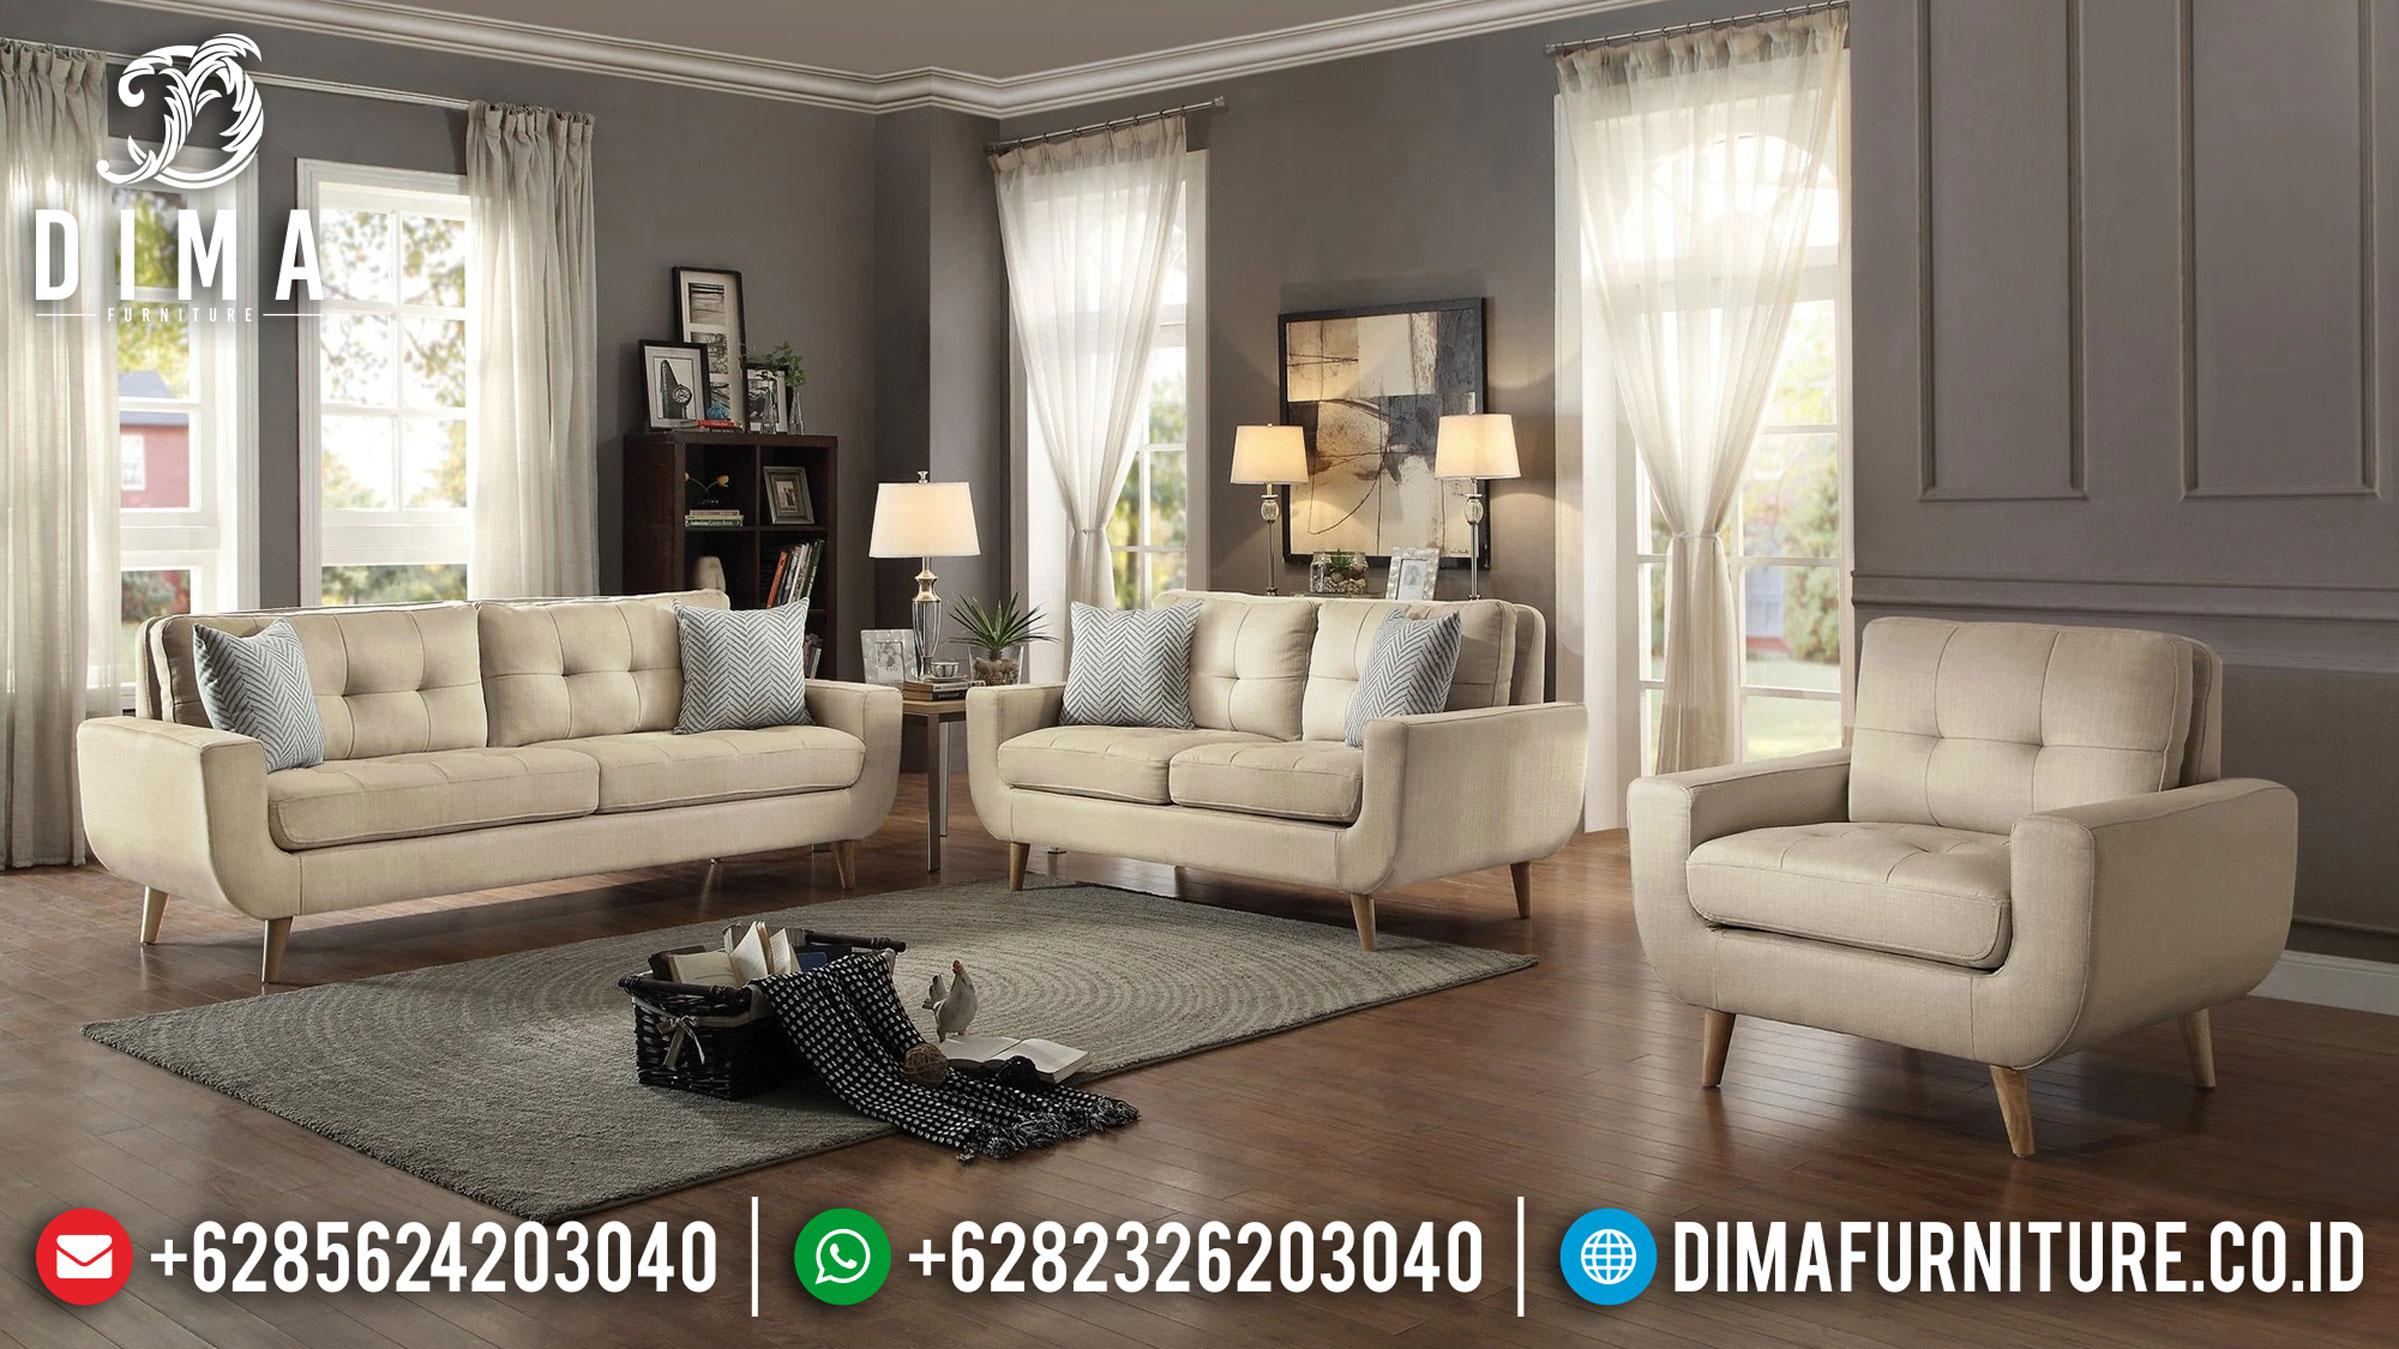 Big Sale Sofa Tamu Minimalis Classic Retro French Style Inspiring MMJ-0934